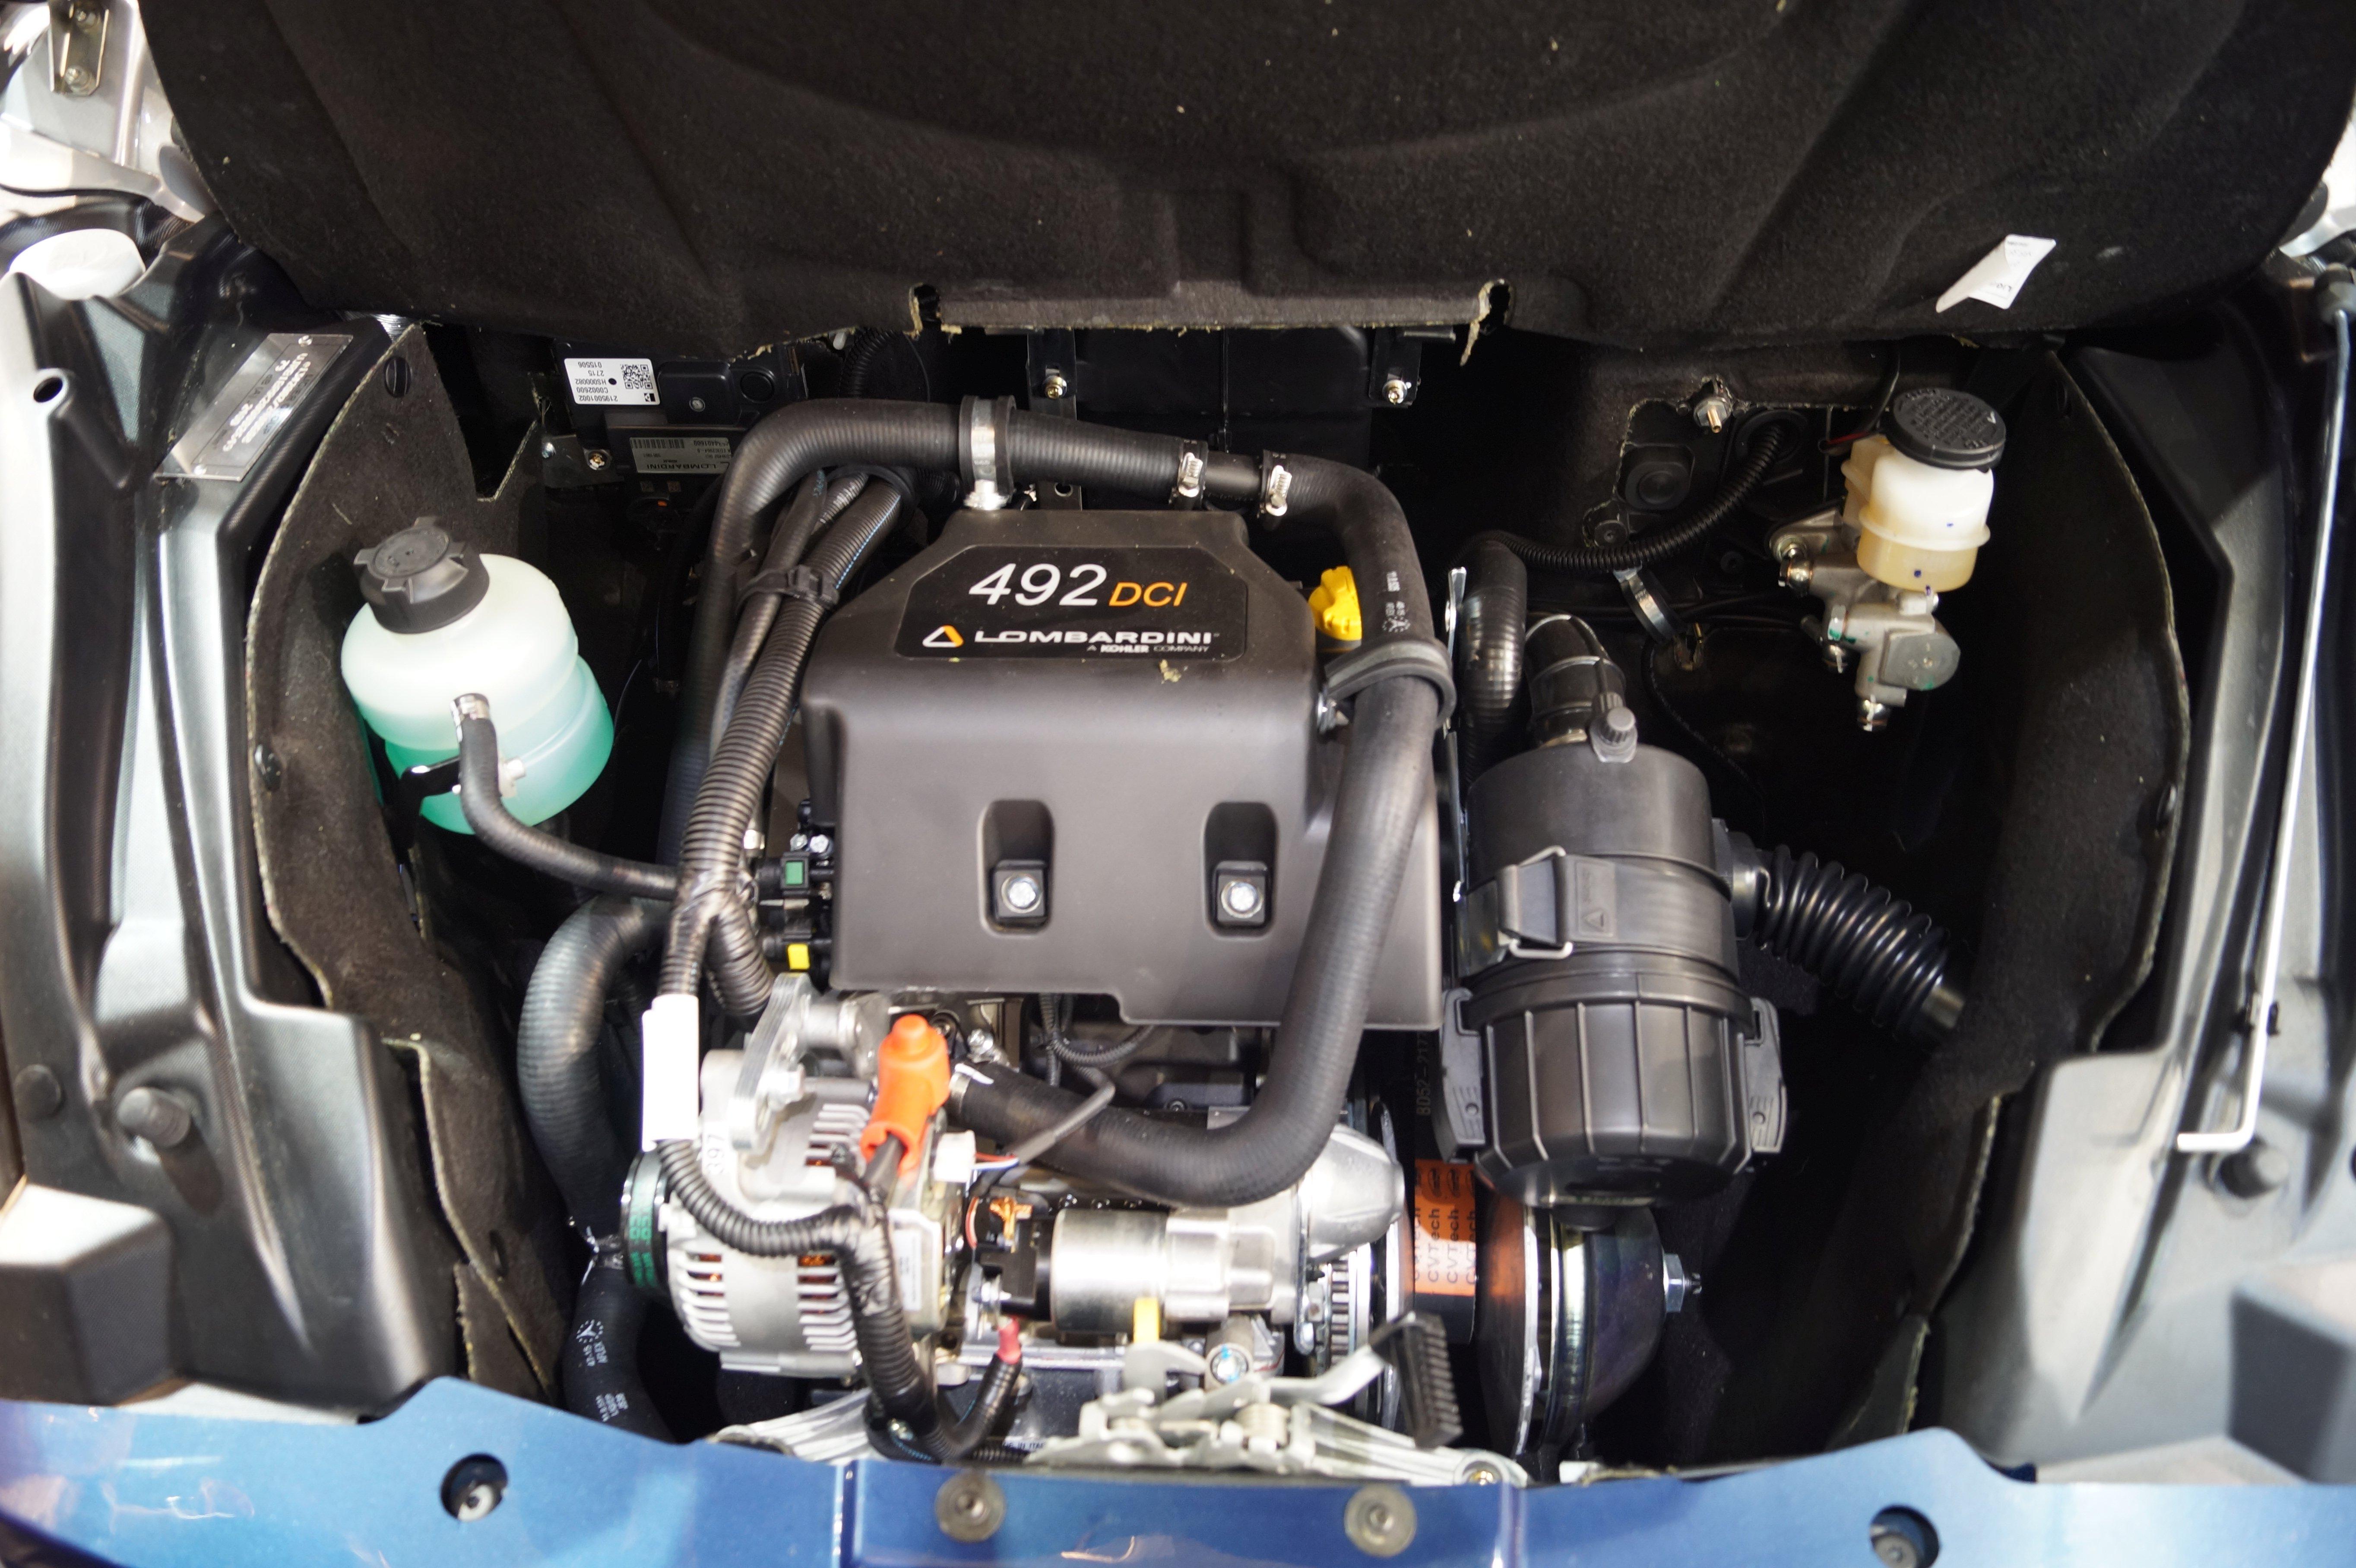 File:Ligier JS50 - silnik Lombardini 492 (MSP16).jpg